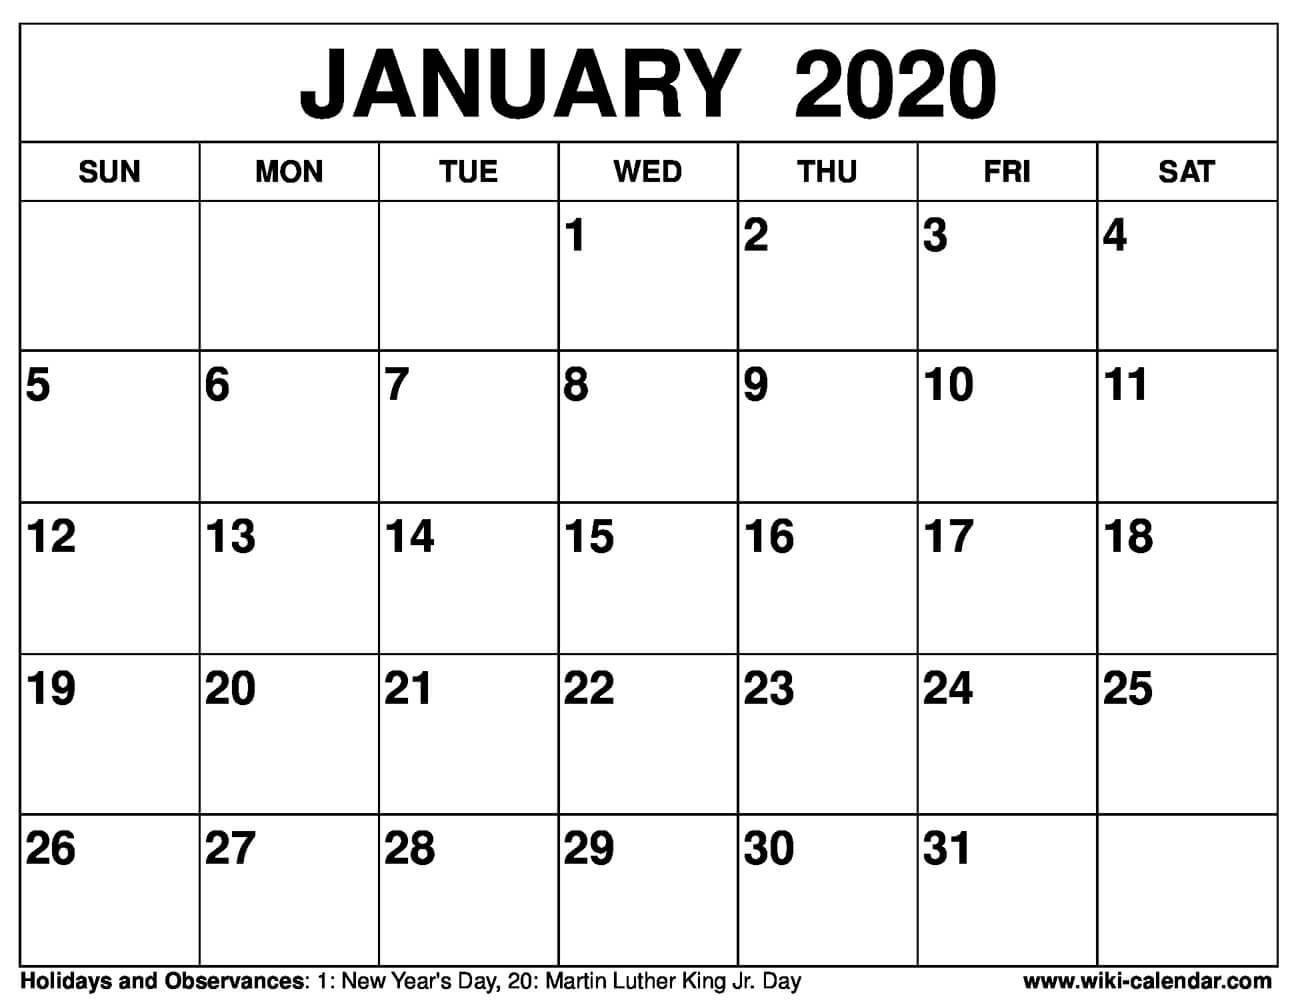 Blank January 2020 Calendar Printable Templates-Wiki Calendar January 2020